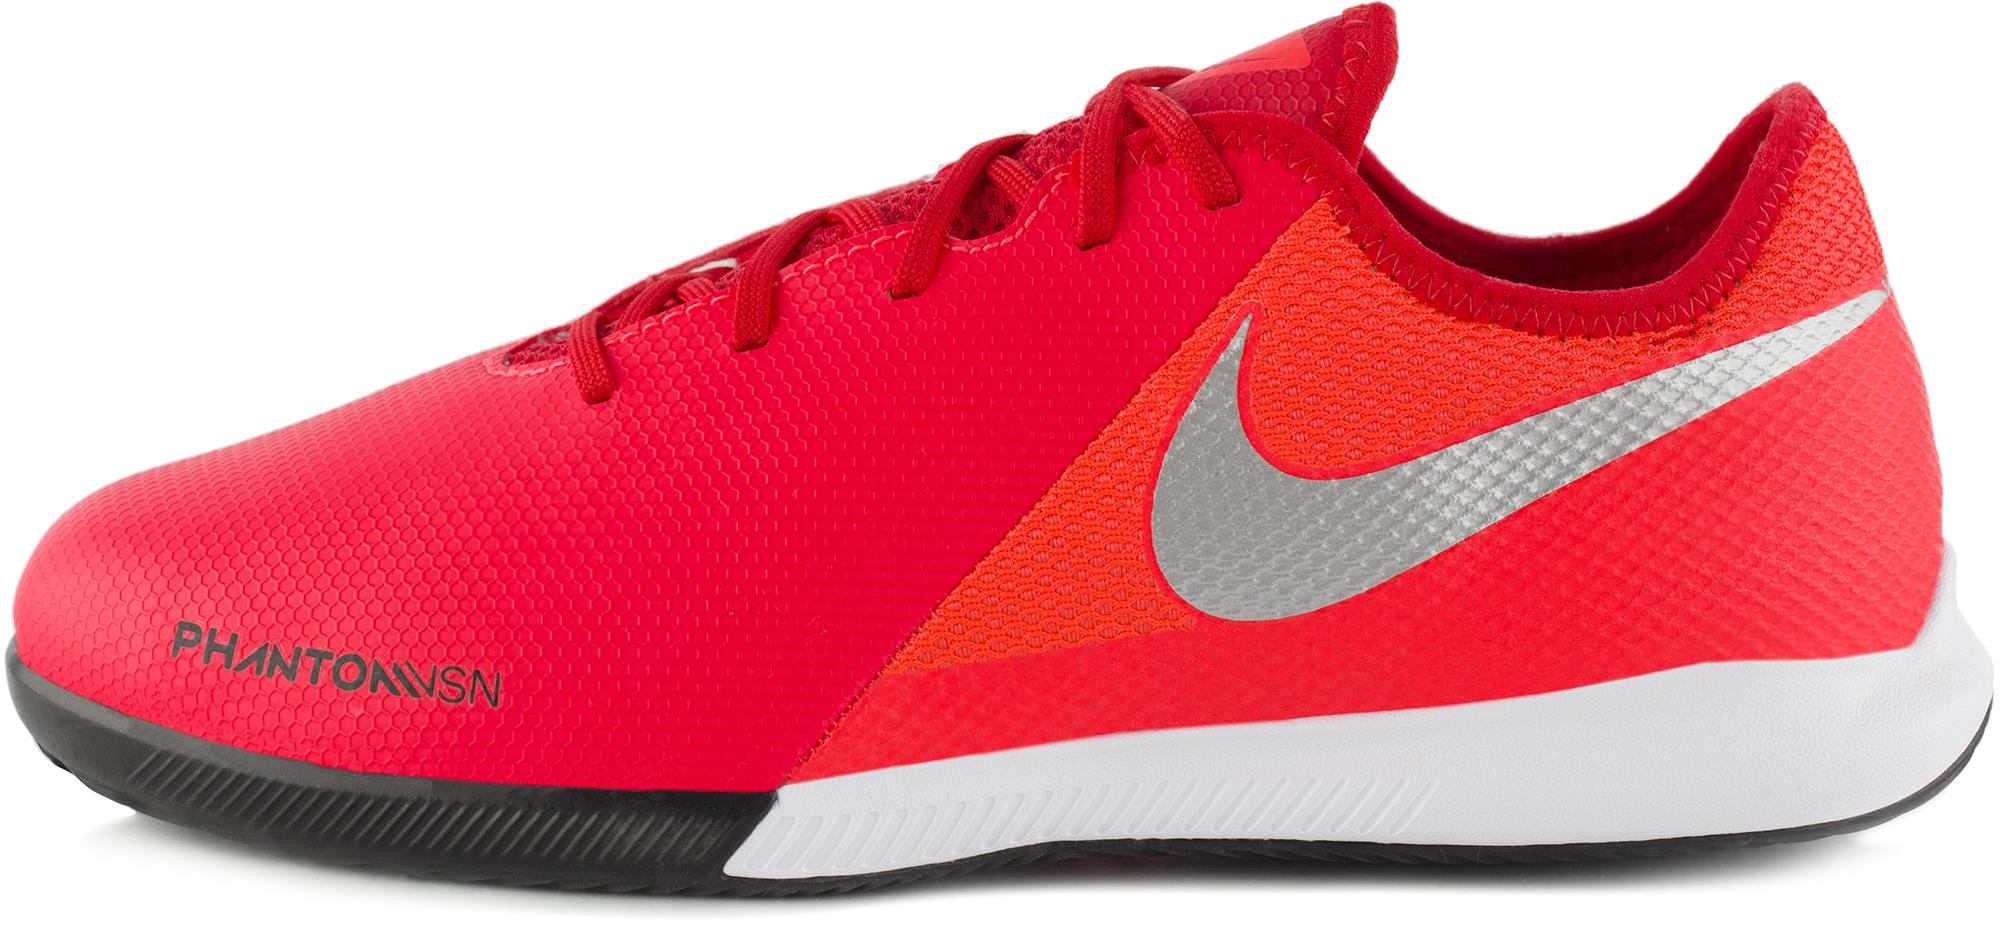 Nike Бутсы для мальчиков Nike Phantom Vsn Academy IC, размер 37,5